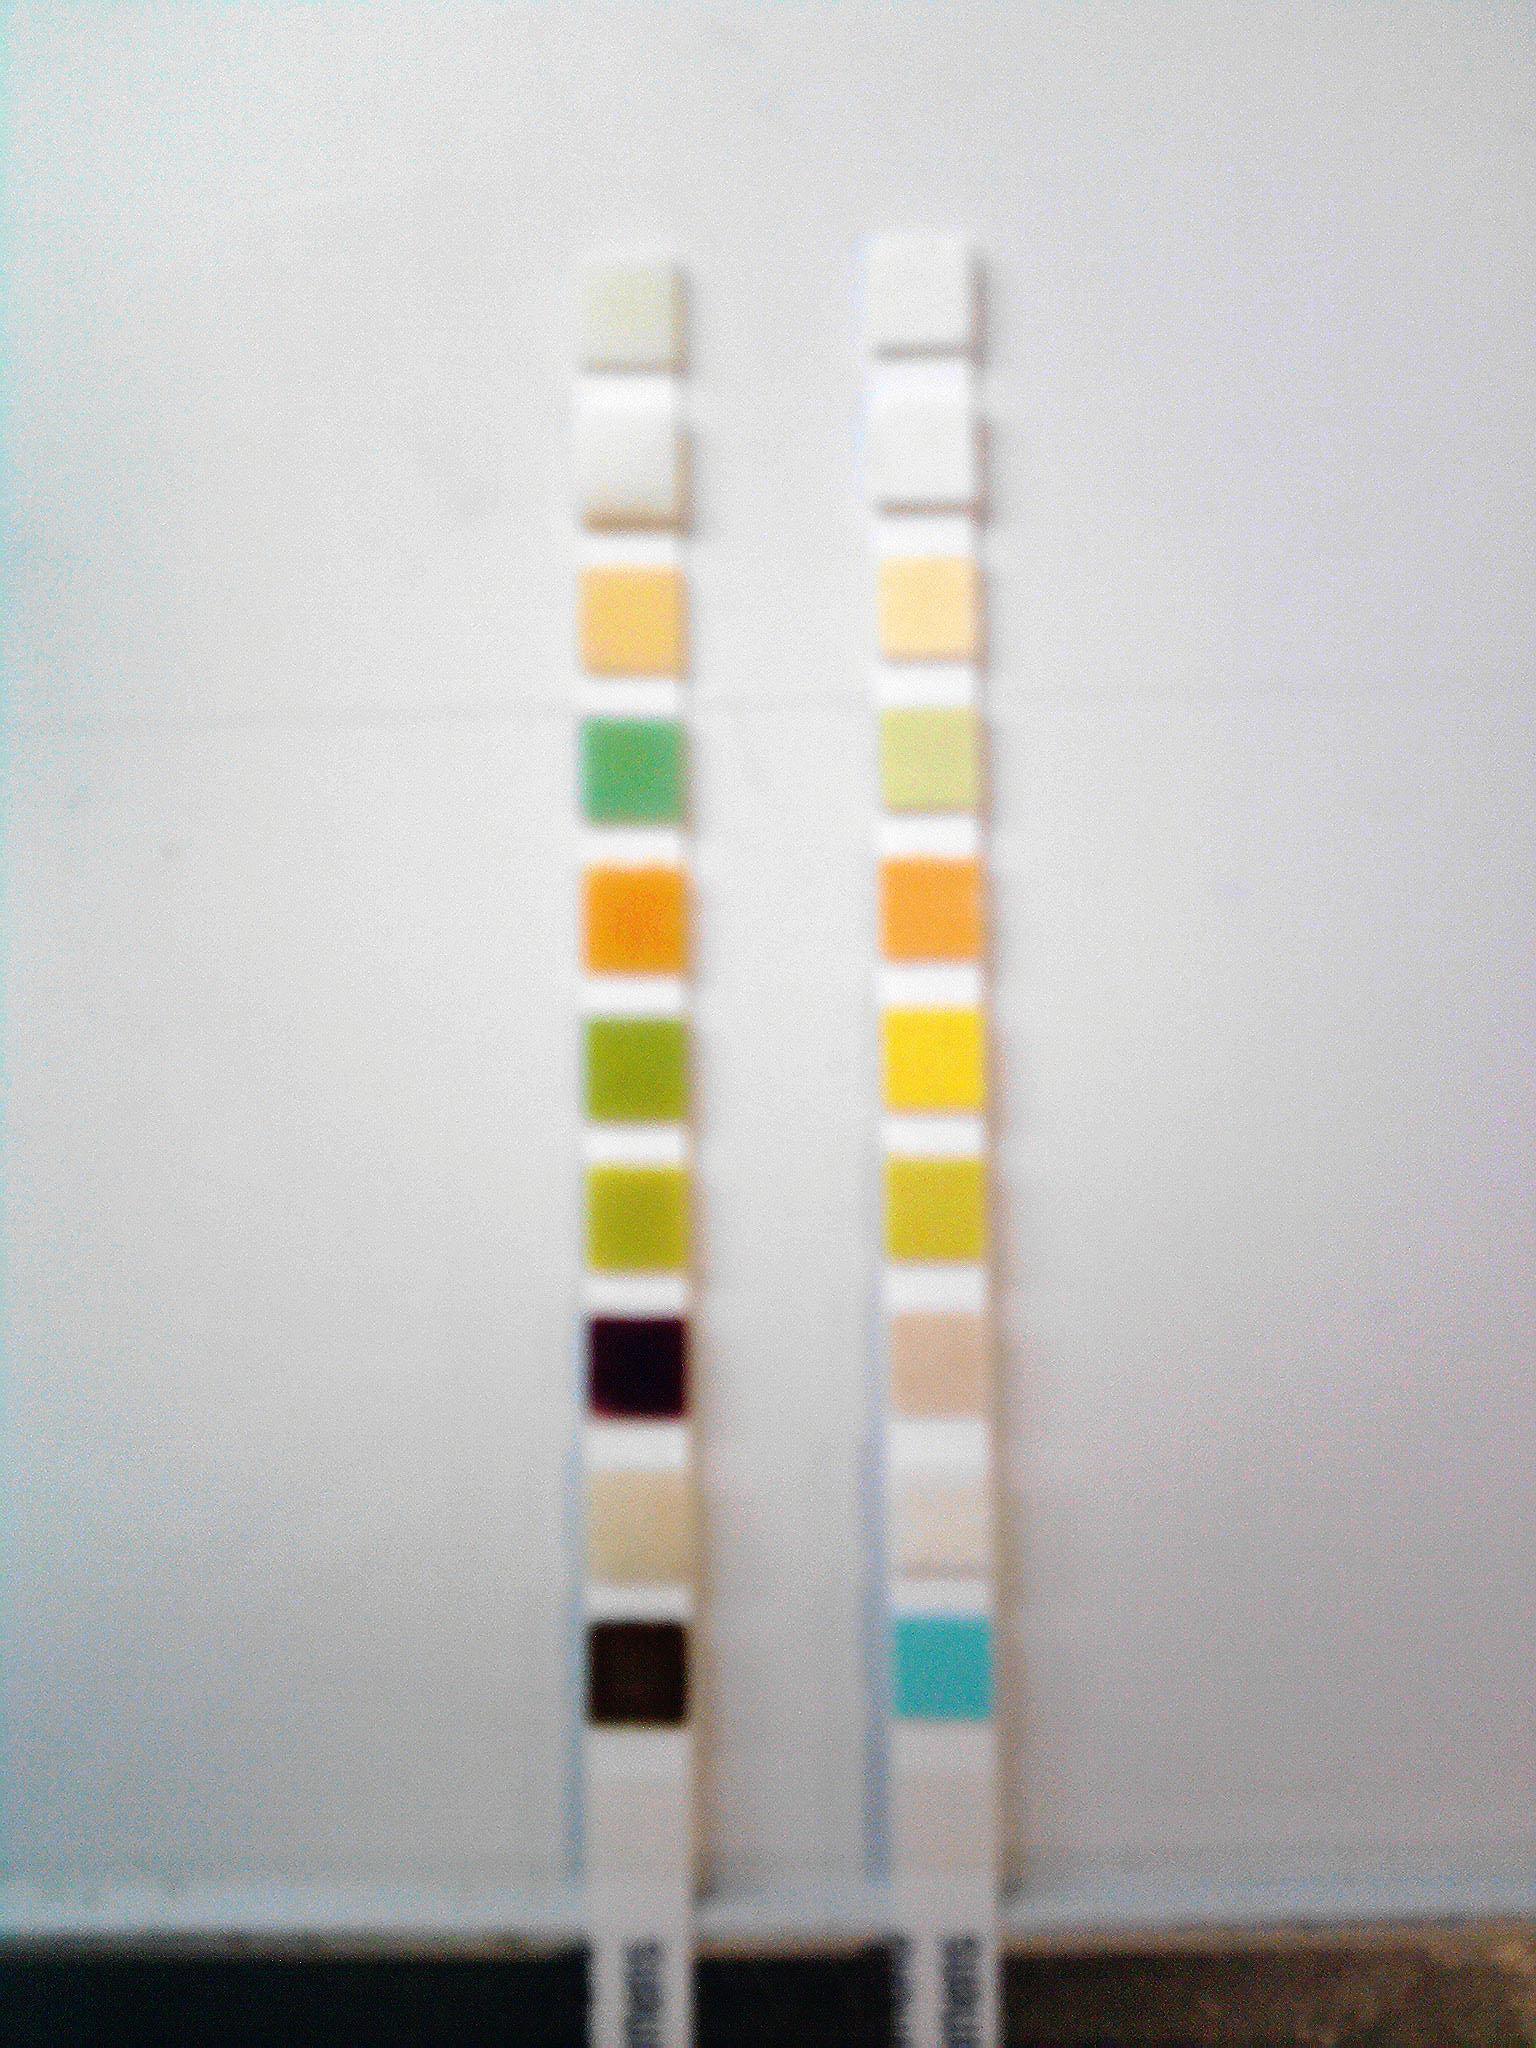 https://upload.wikimedia.org/wikipedia/commons/c/c3/Comp.Urine.Test.Strip.jpg